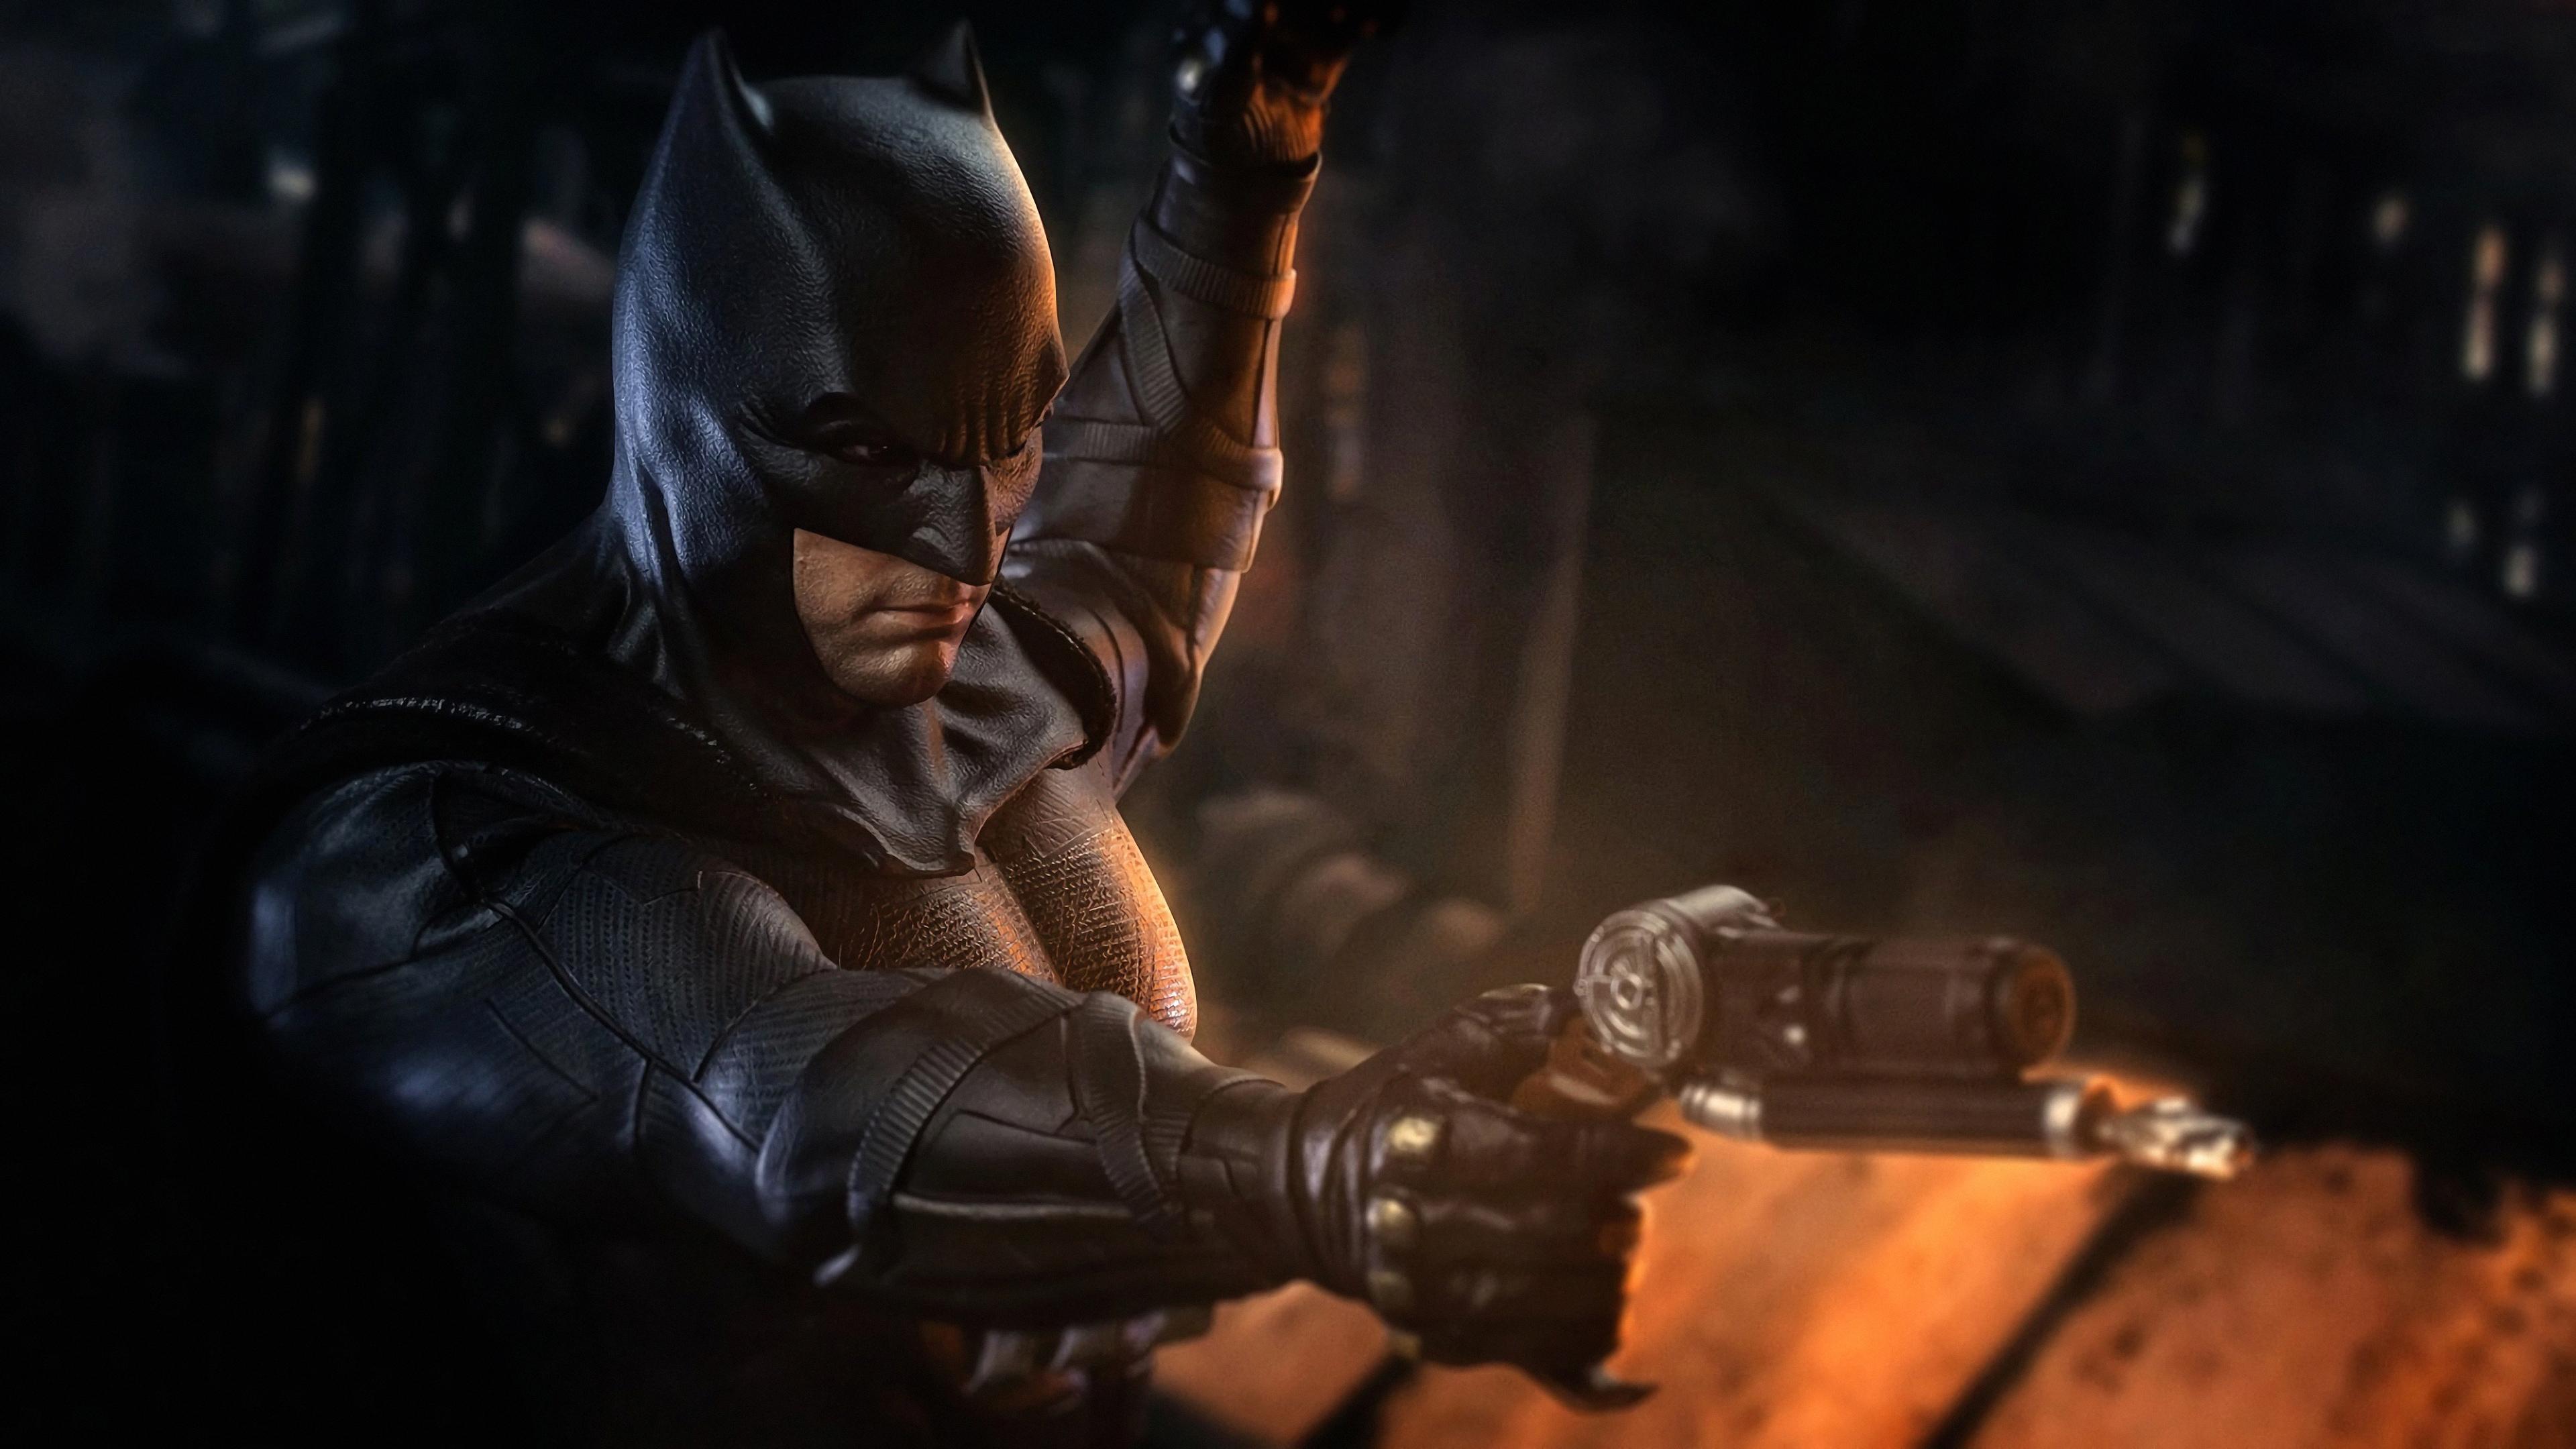 batman knight 1569186372 - Batman Knight - superheroes wallpapers, hd-wallpapers, digital art wallpapers, batman wallpapers, artwork wallpapers, 4k-wallpapers